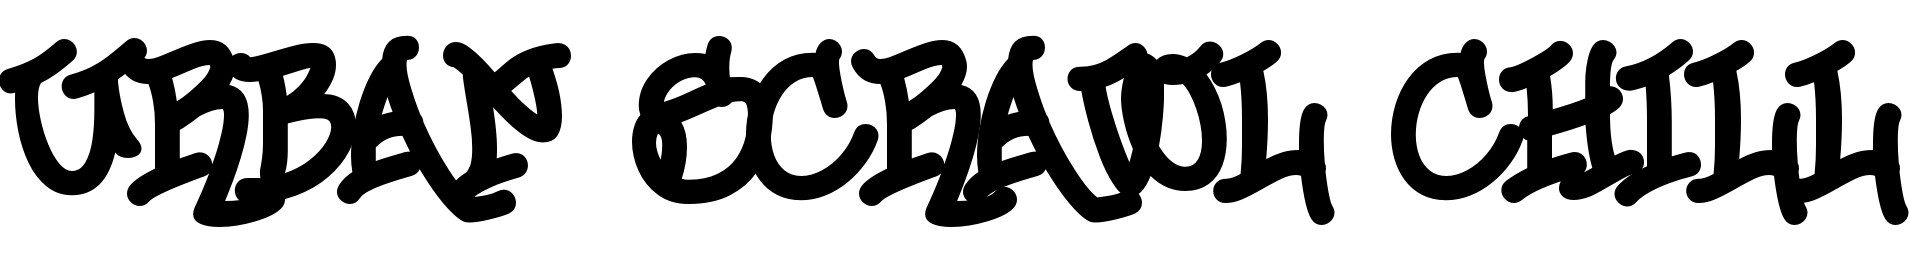 Urban Scrawl Chill